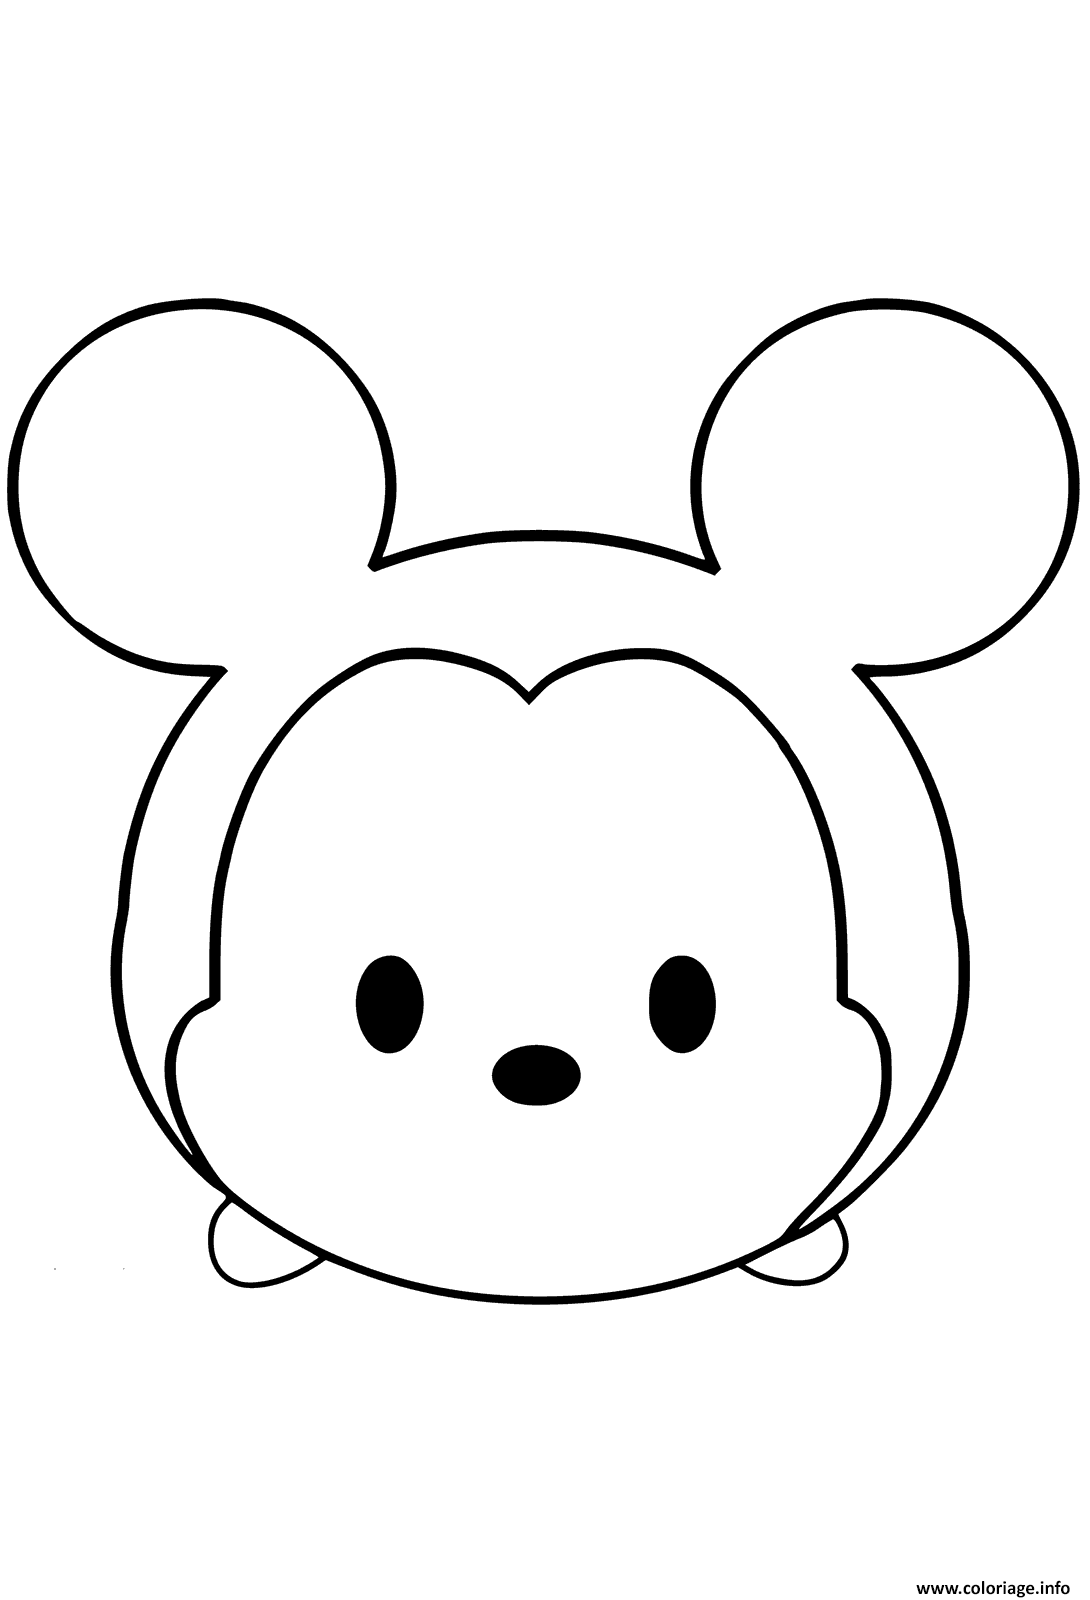 Coloriage Mickey Mouse Emoji Face Tsum Tsum Dessin